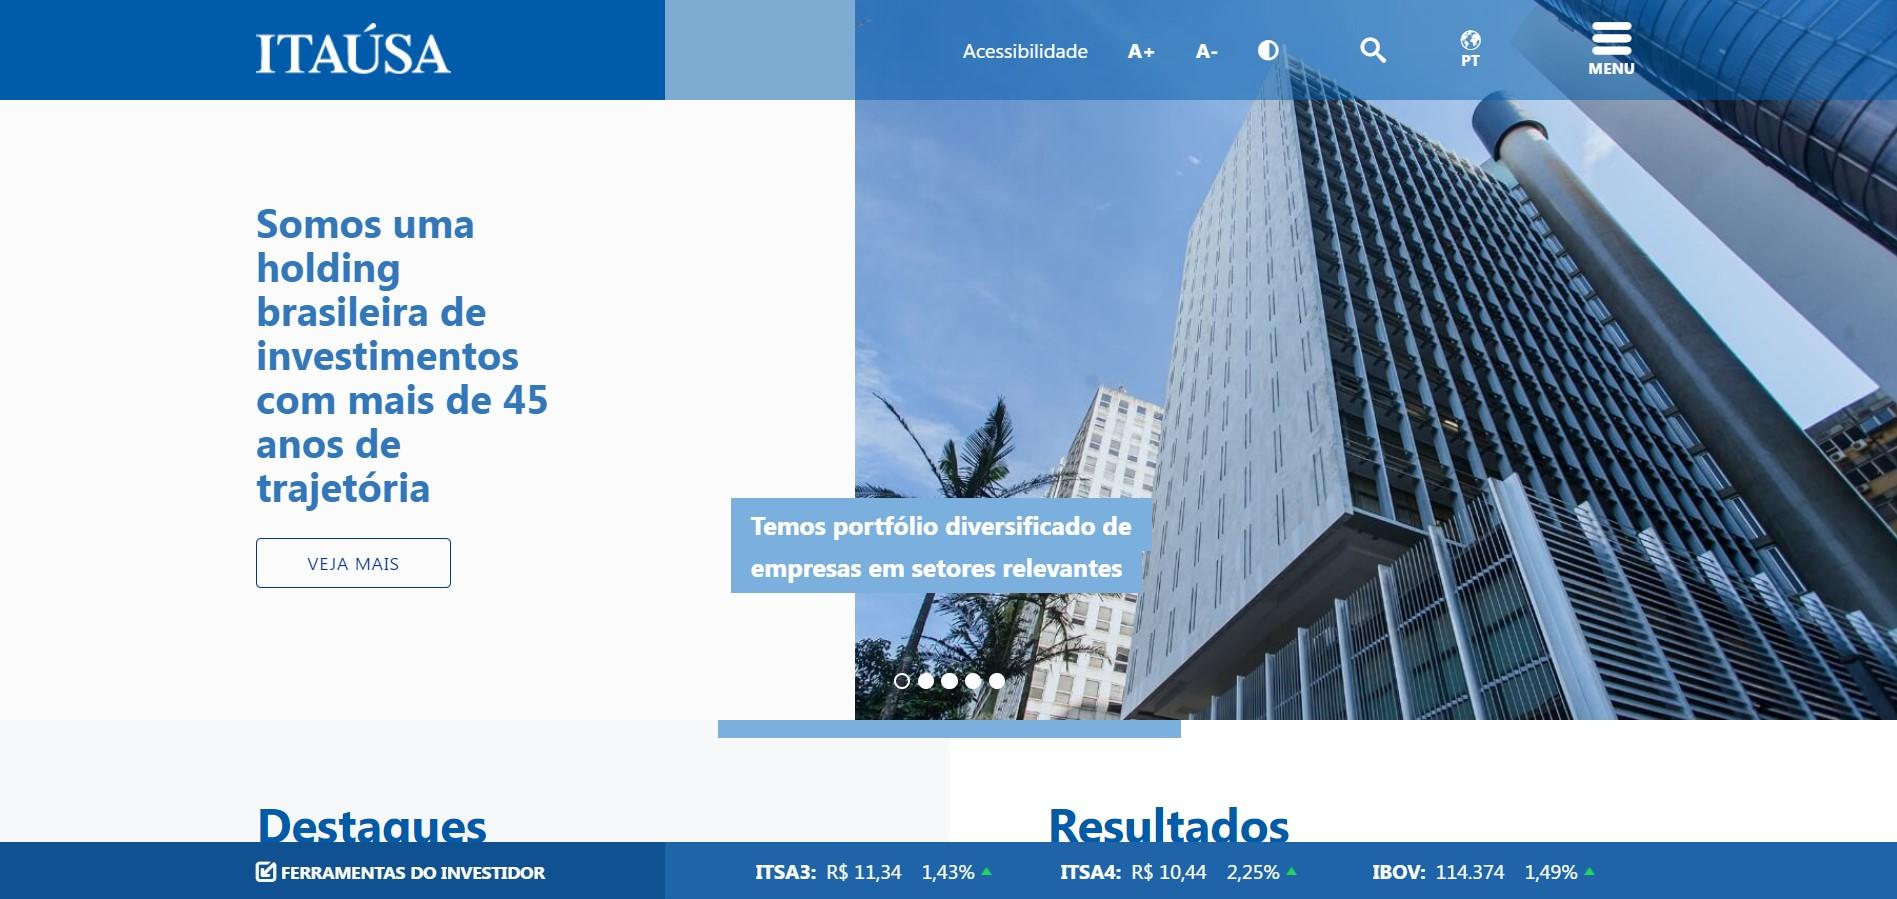 Itaúsa apresenta novo site